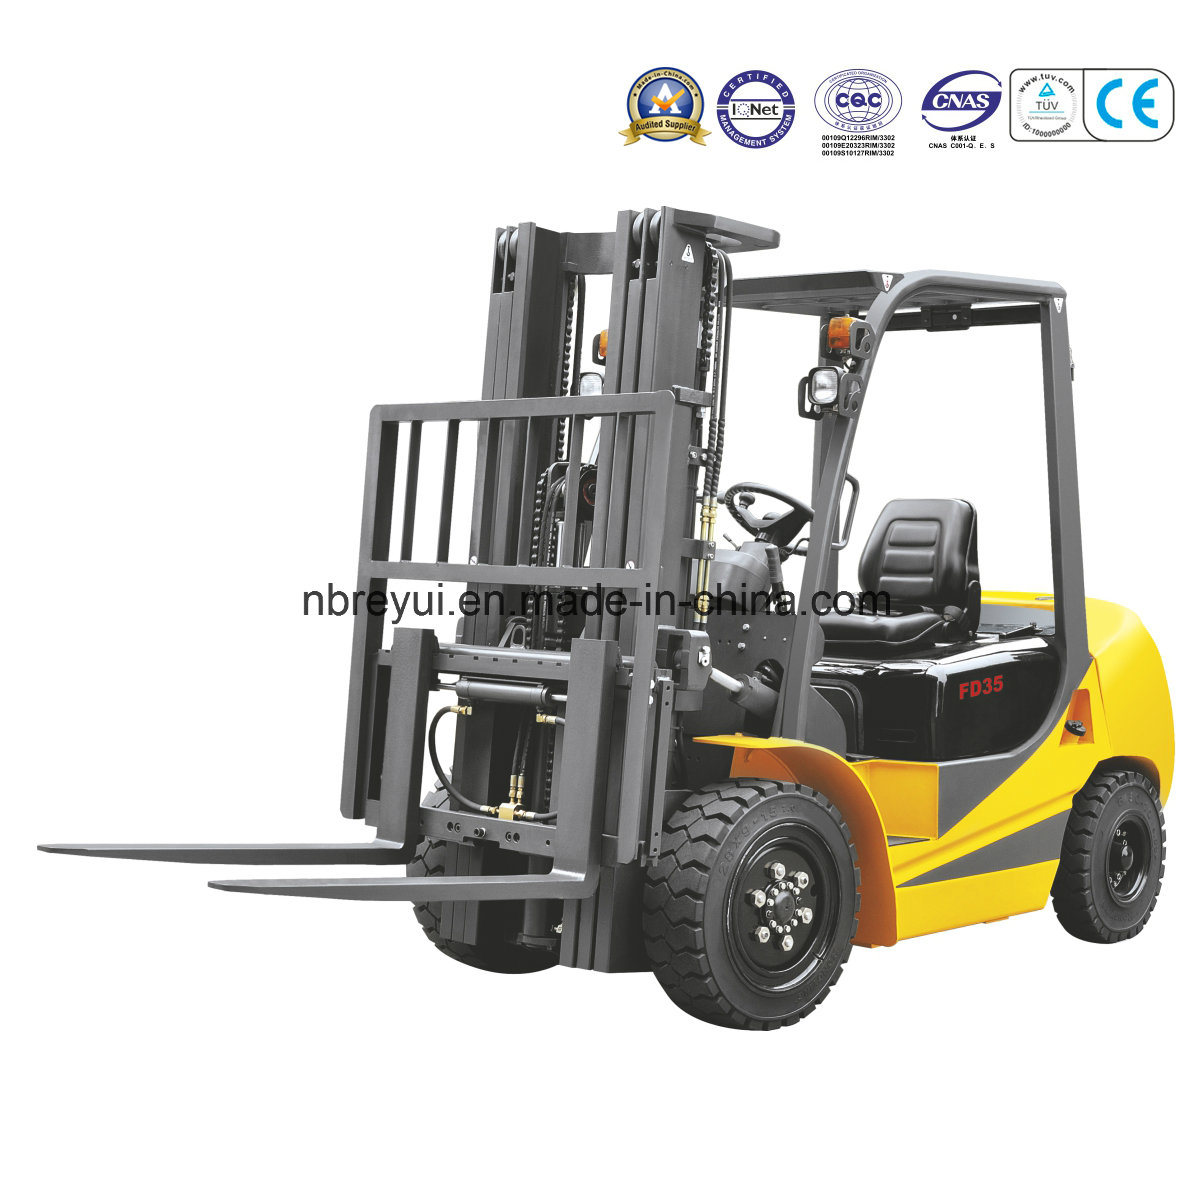 2.5-3.5t Diesel/Gasoline Forklift Truck